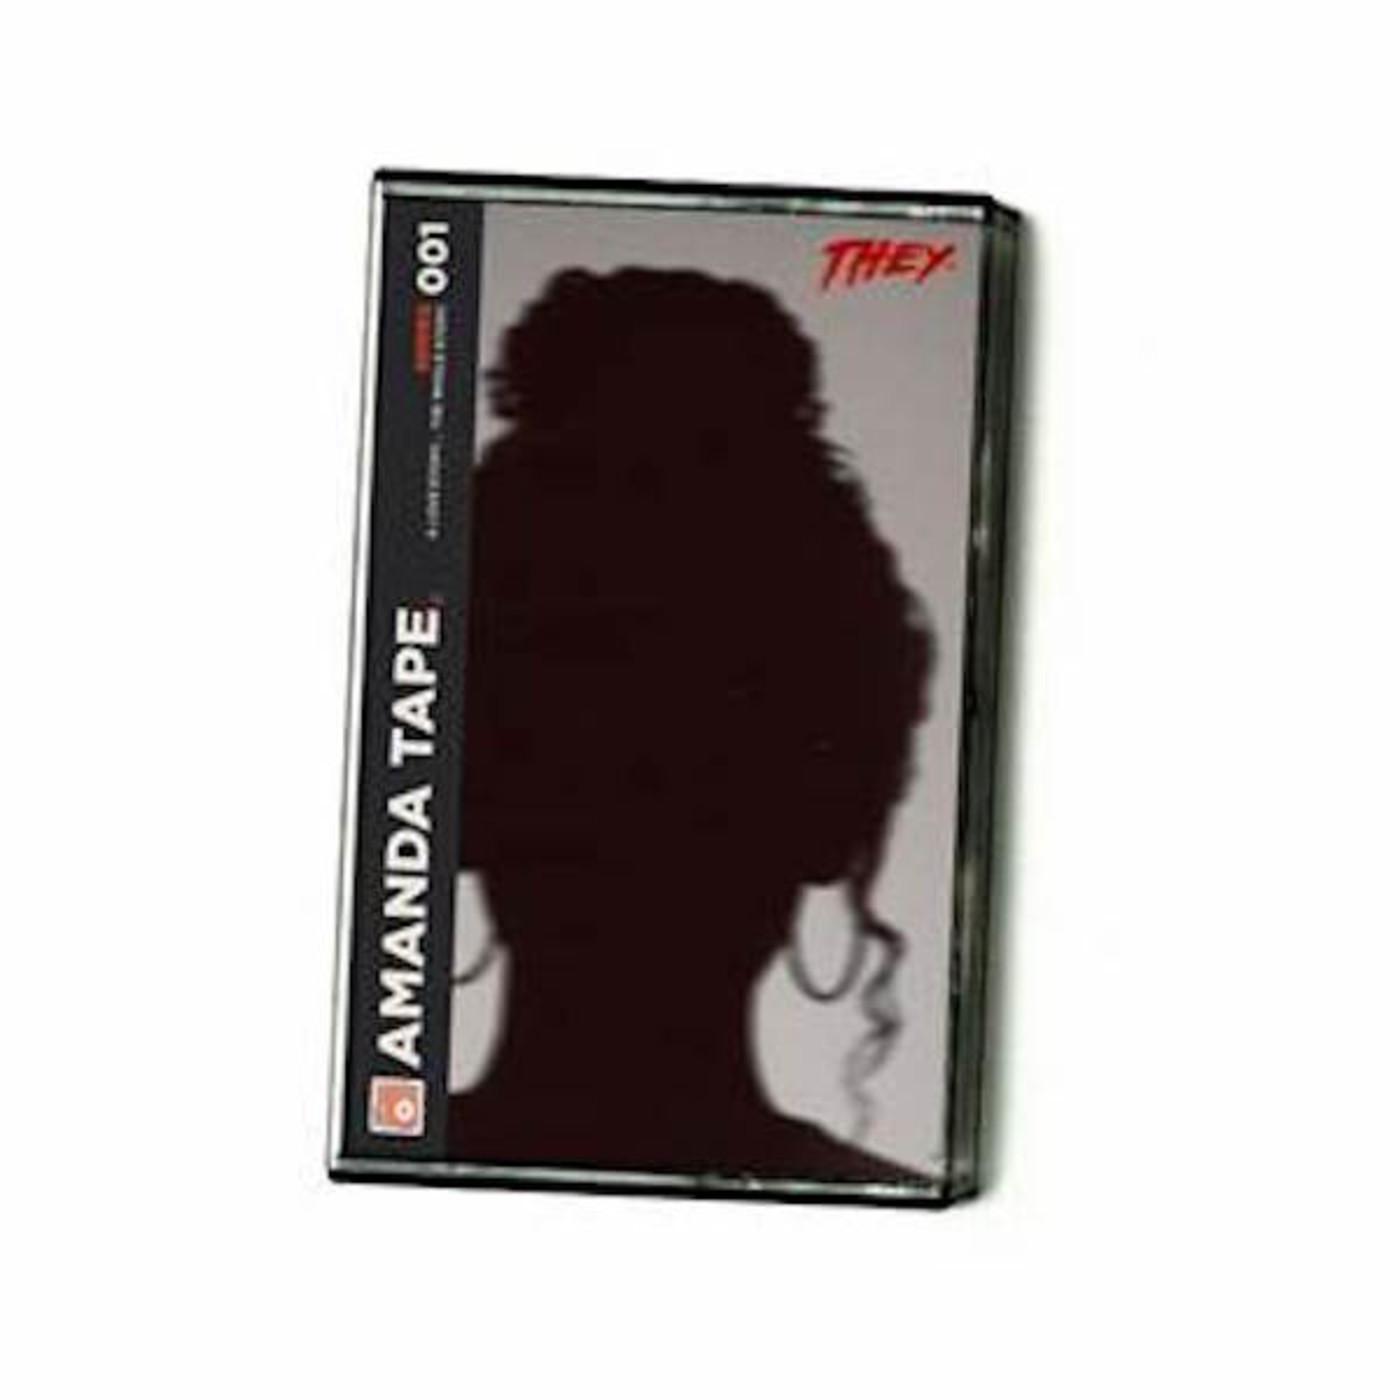 THEY. - 'The Amanda Tape'